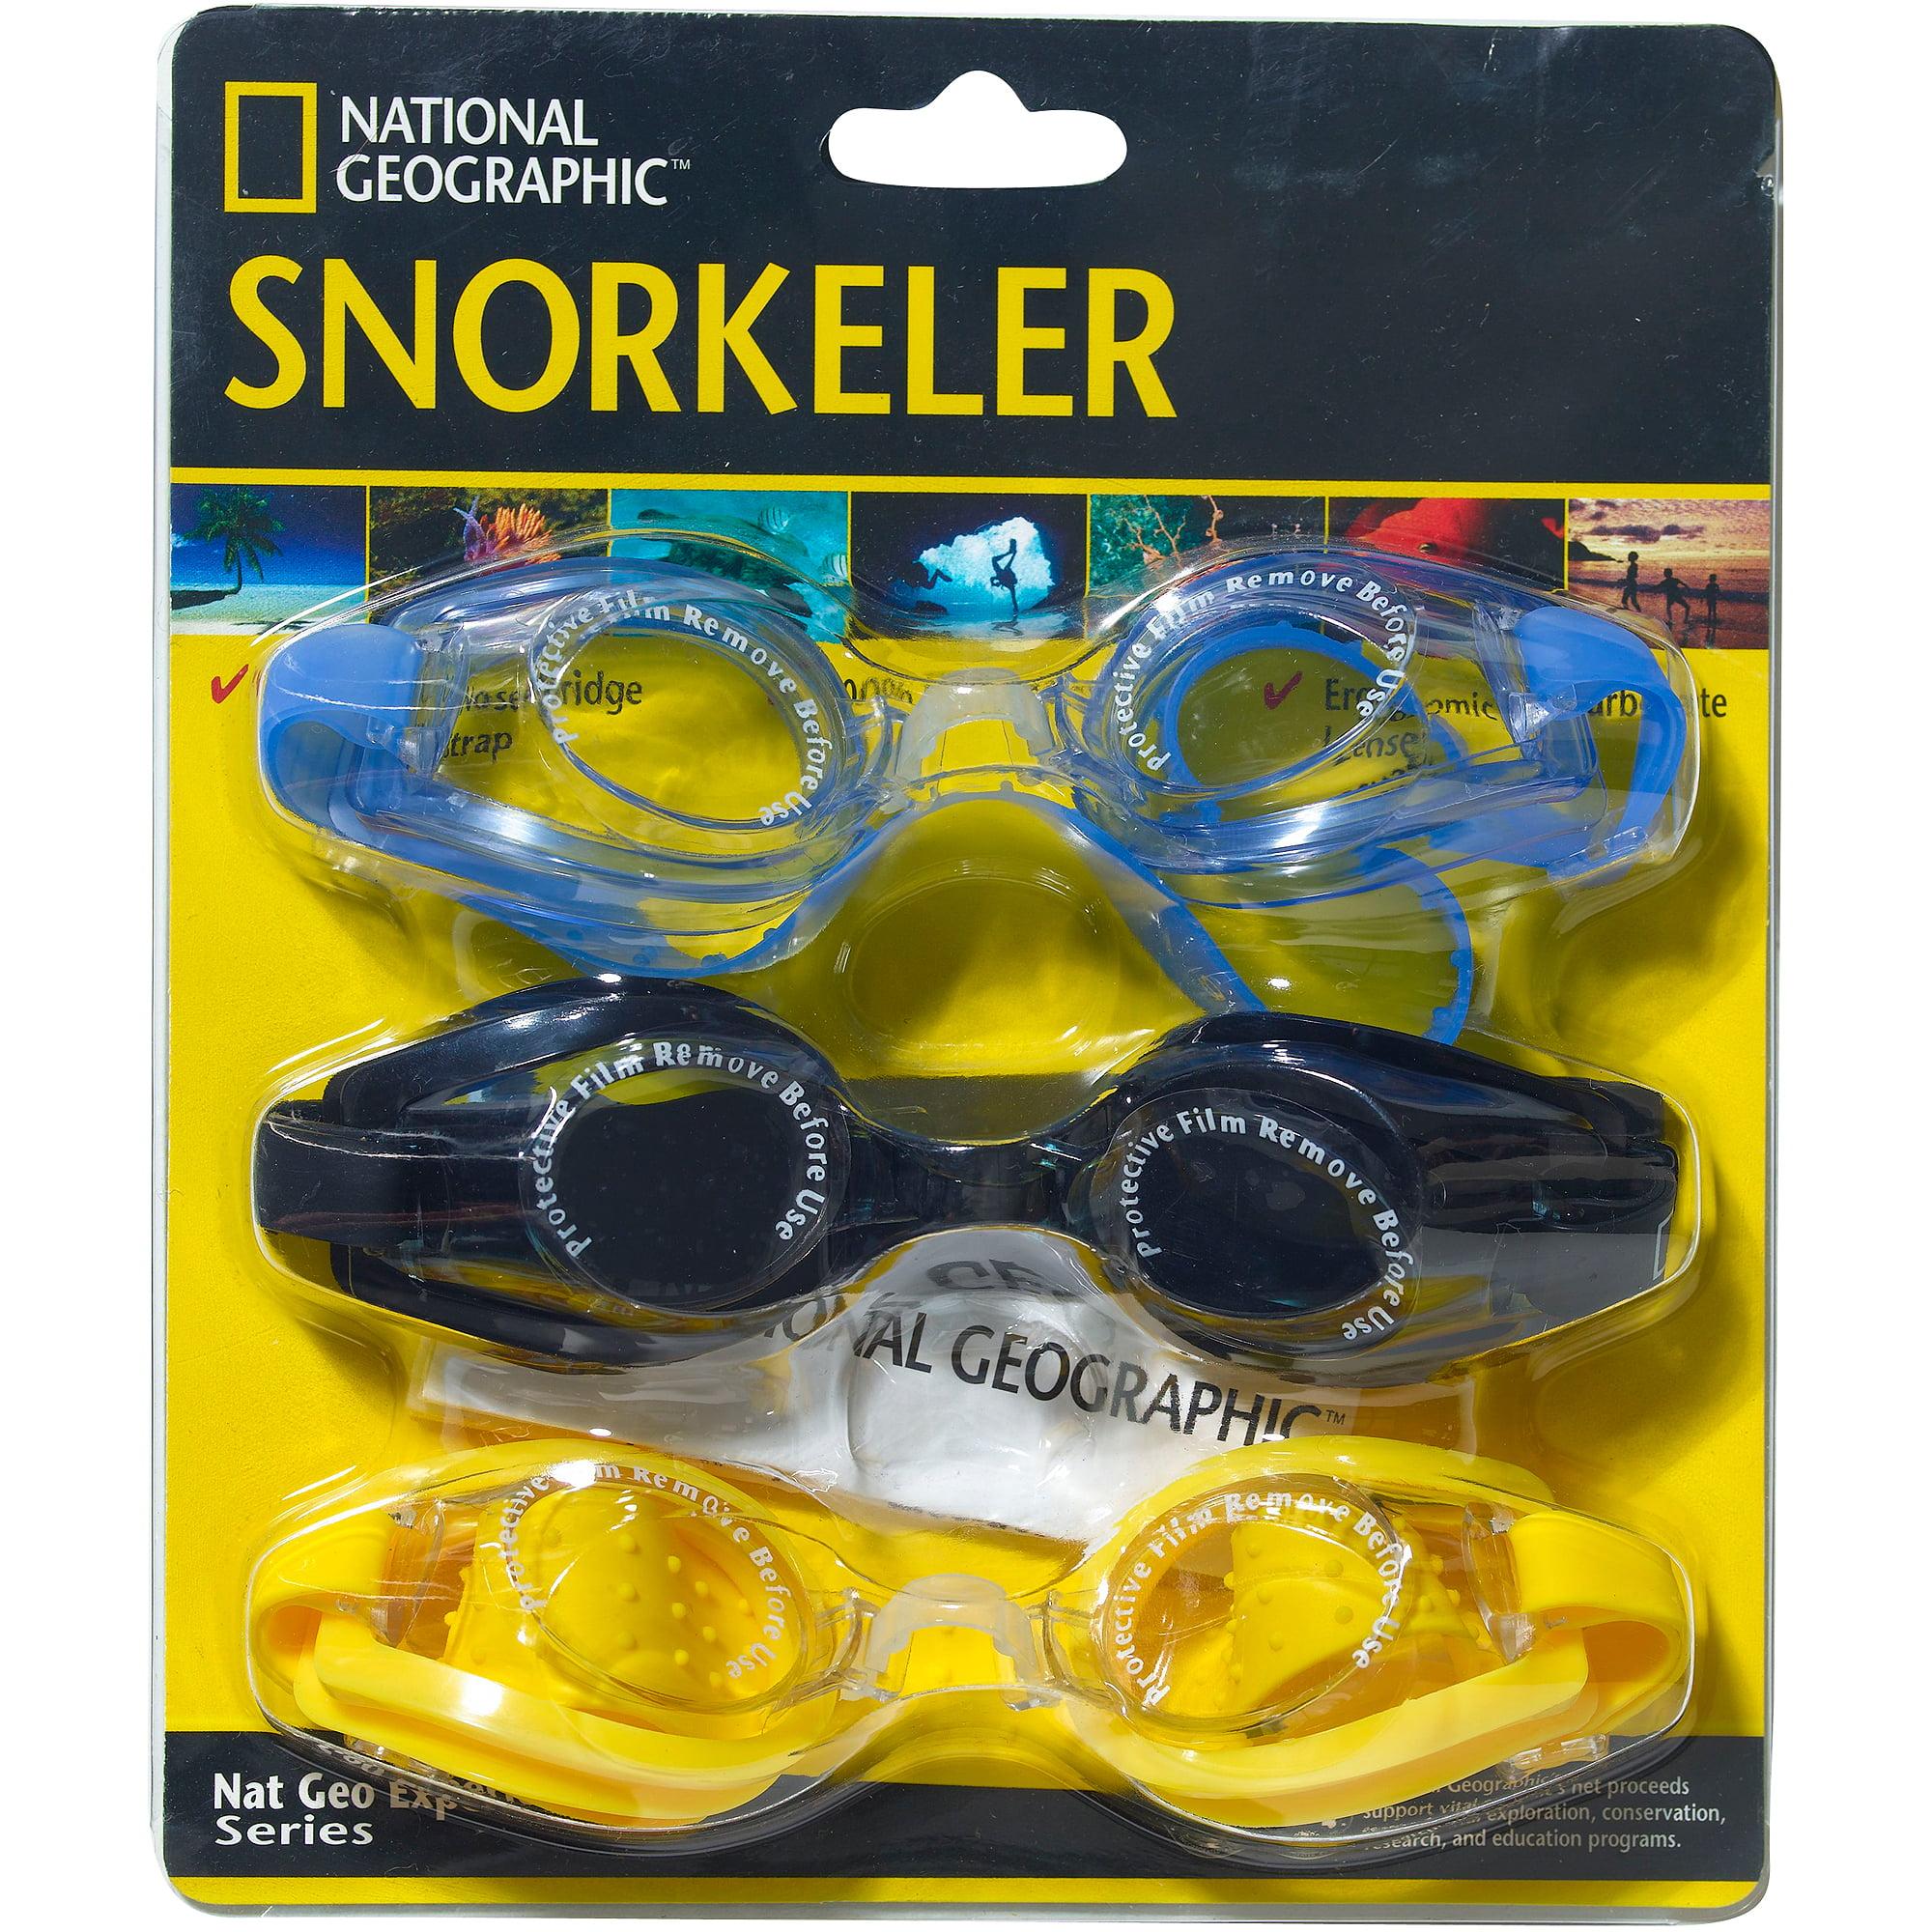 National Geographic Snorkeler Swim Goggle 3-Pack with Adjustable Nose Bridge